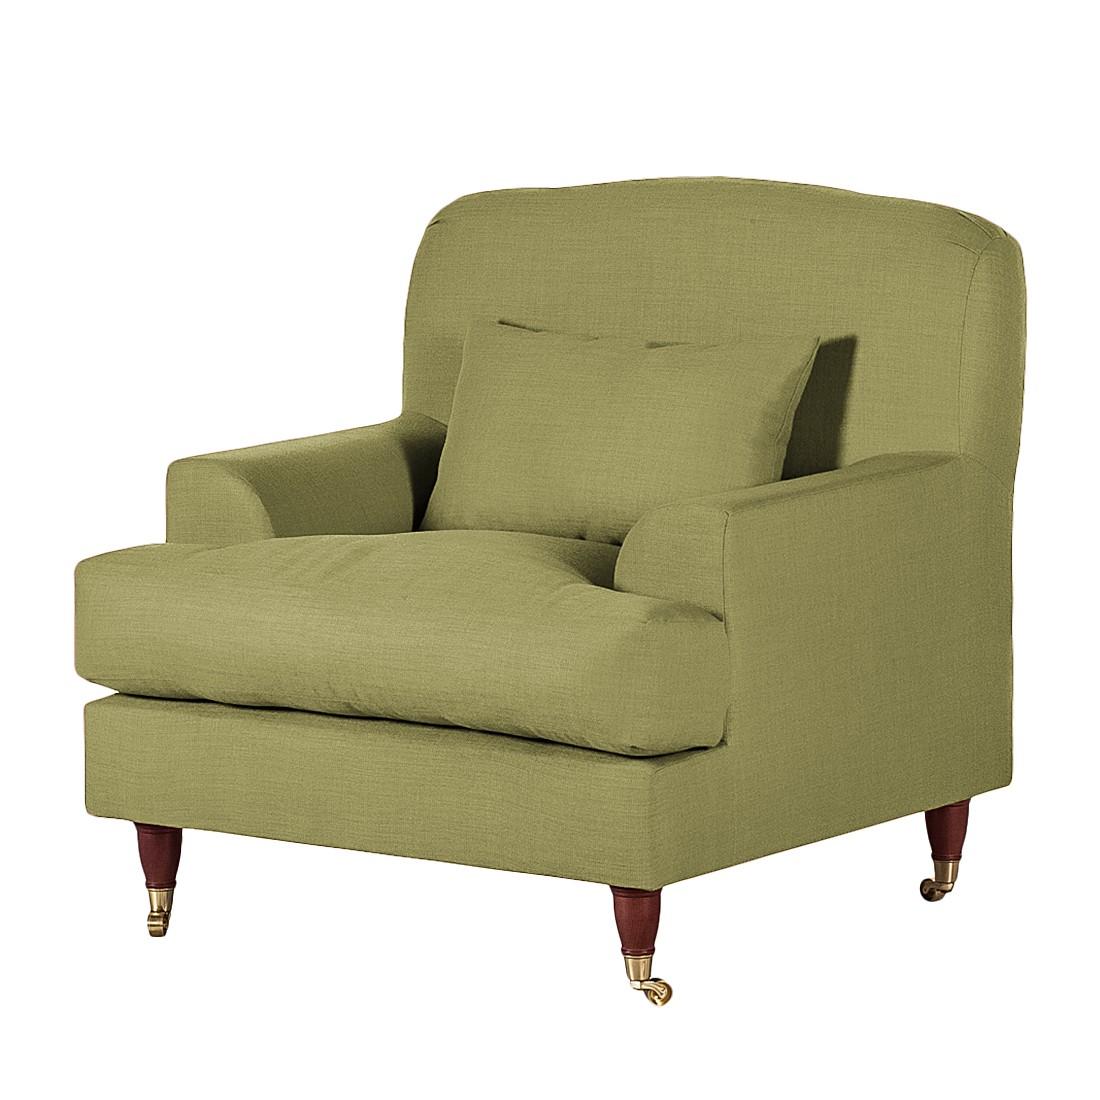 Sessel Bent – Webstoff Olivgrün, Maison Belfort jetzt kaufen